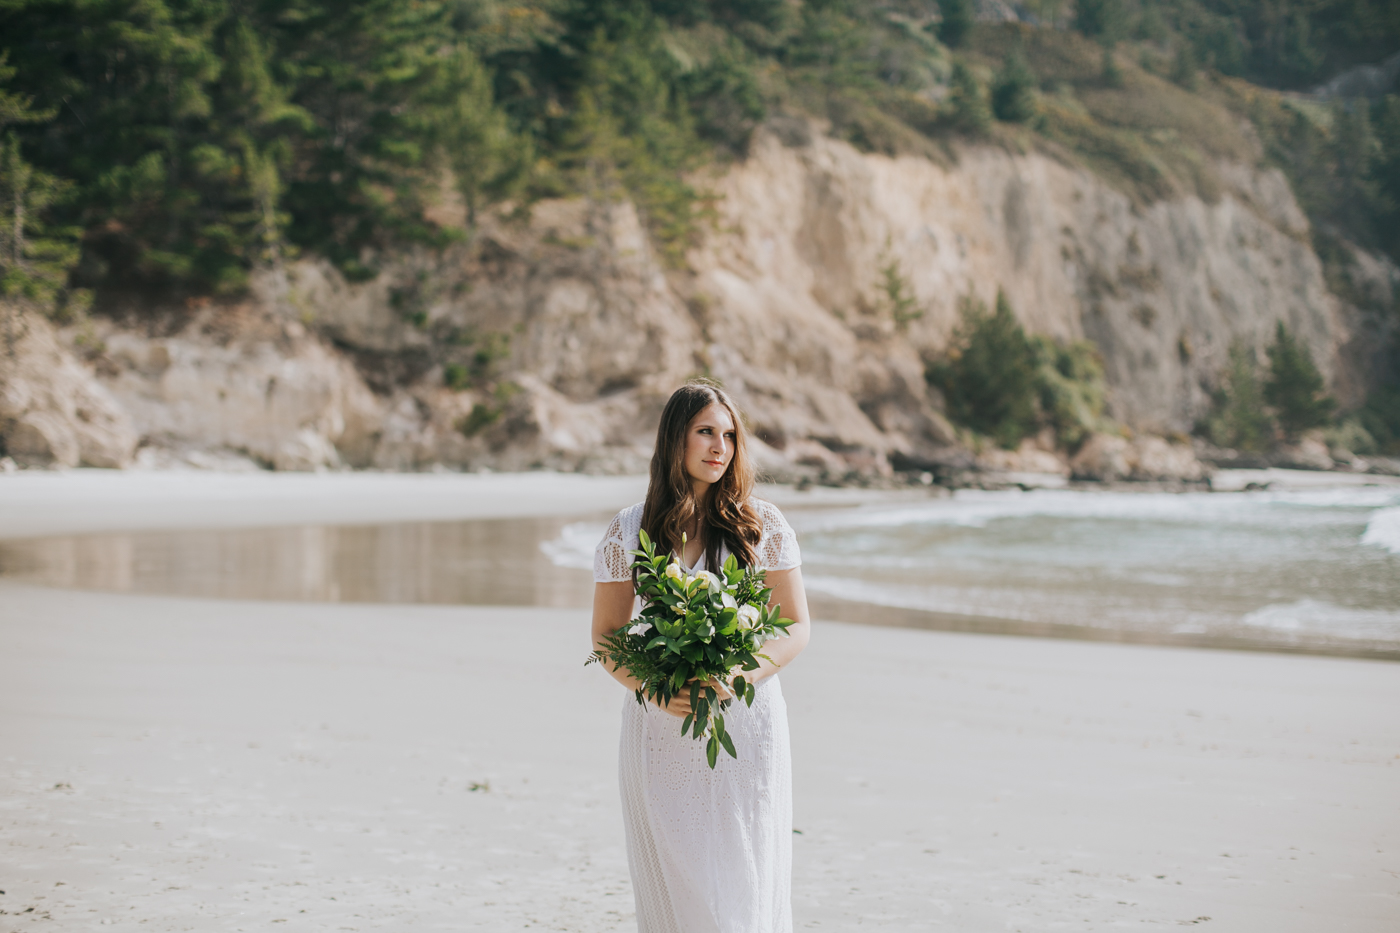 Ariana & Tim - Dunedin, New Zealand Wedding - Destination Wedding - Samantha Heather Photography-131.jpg